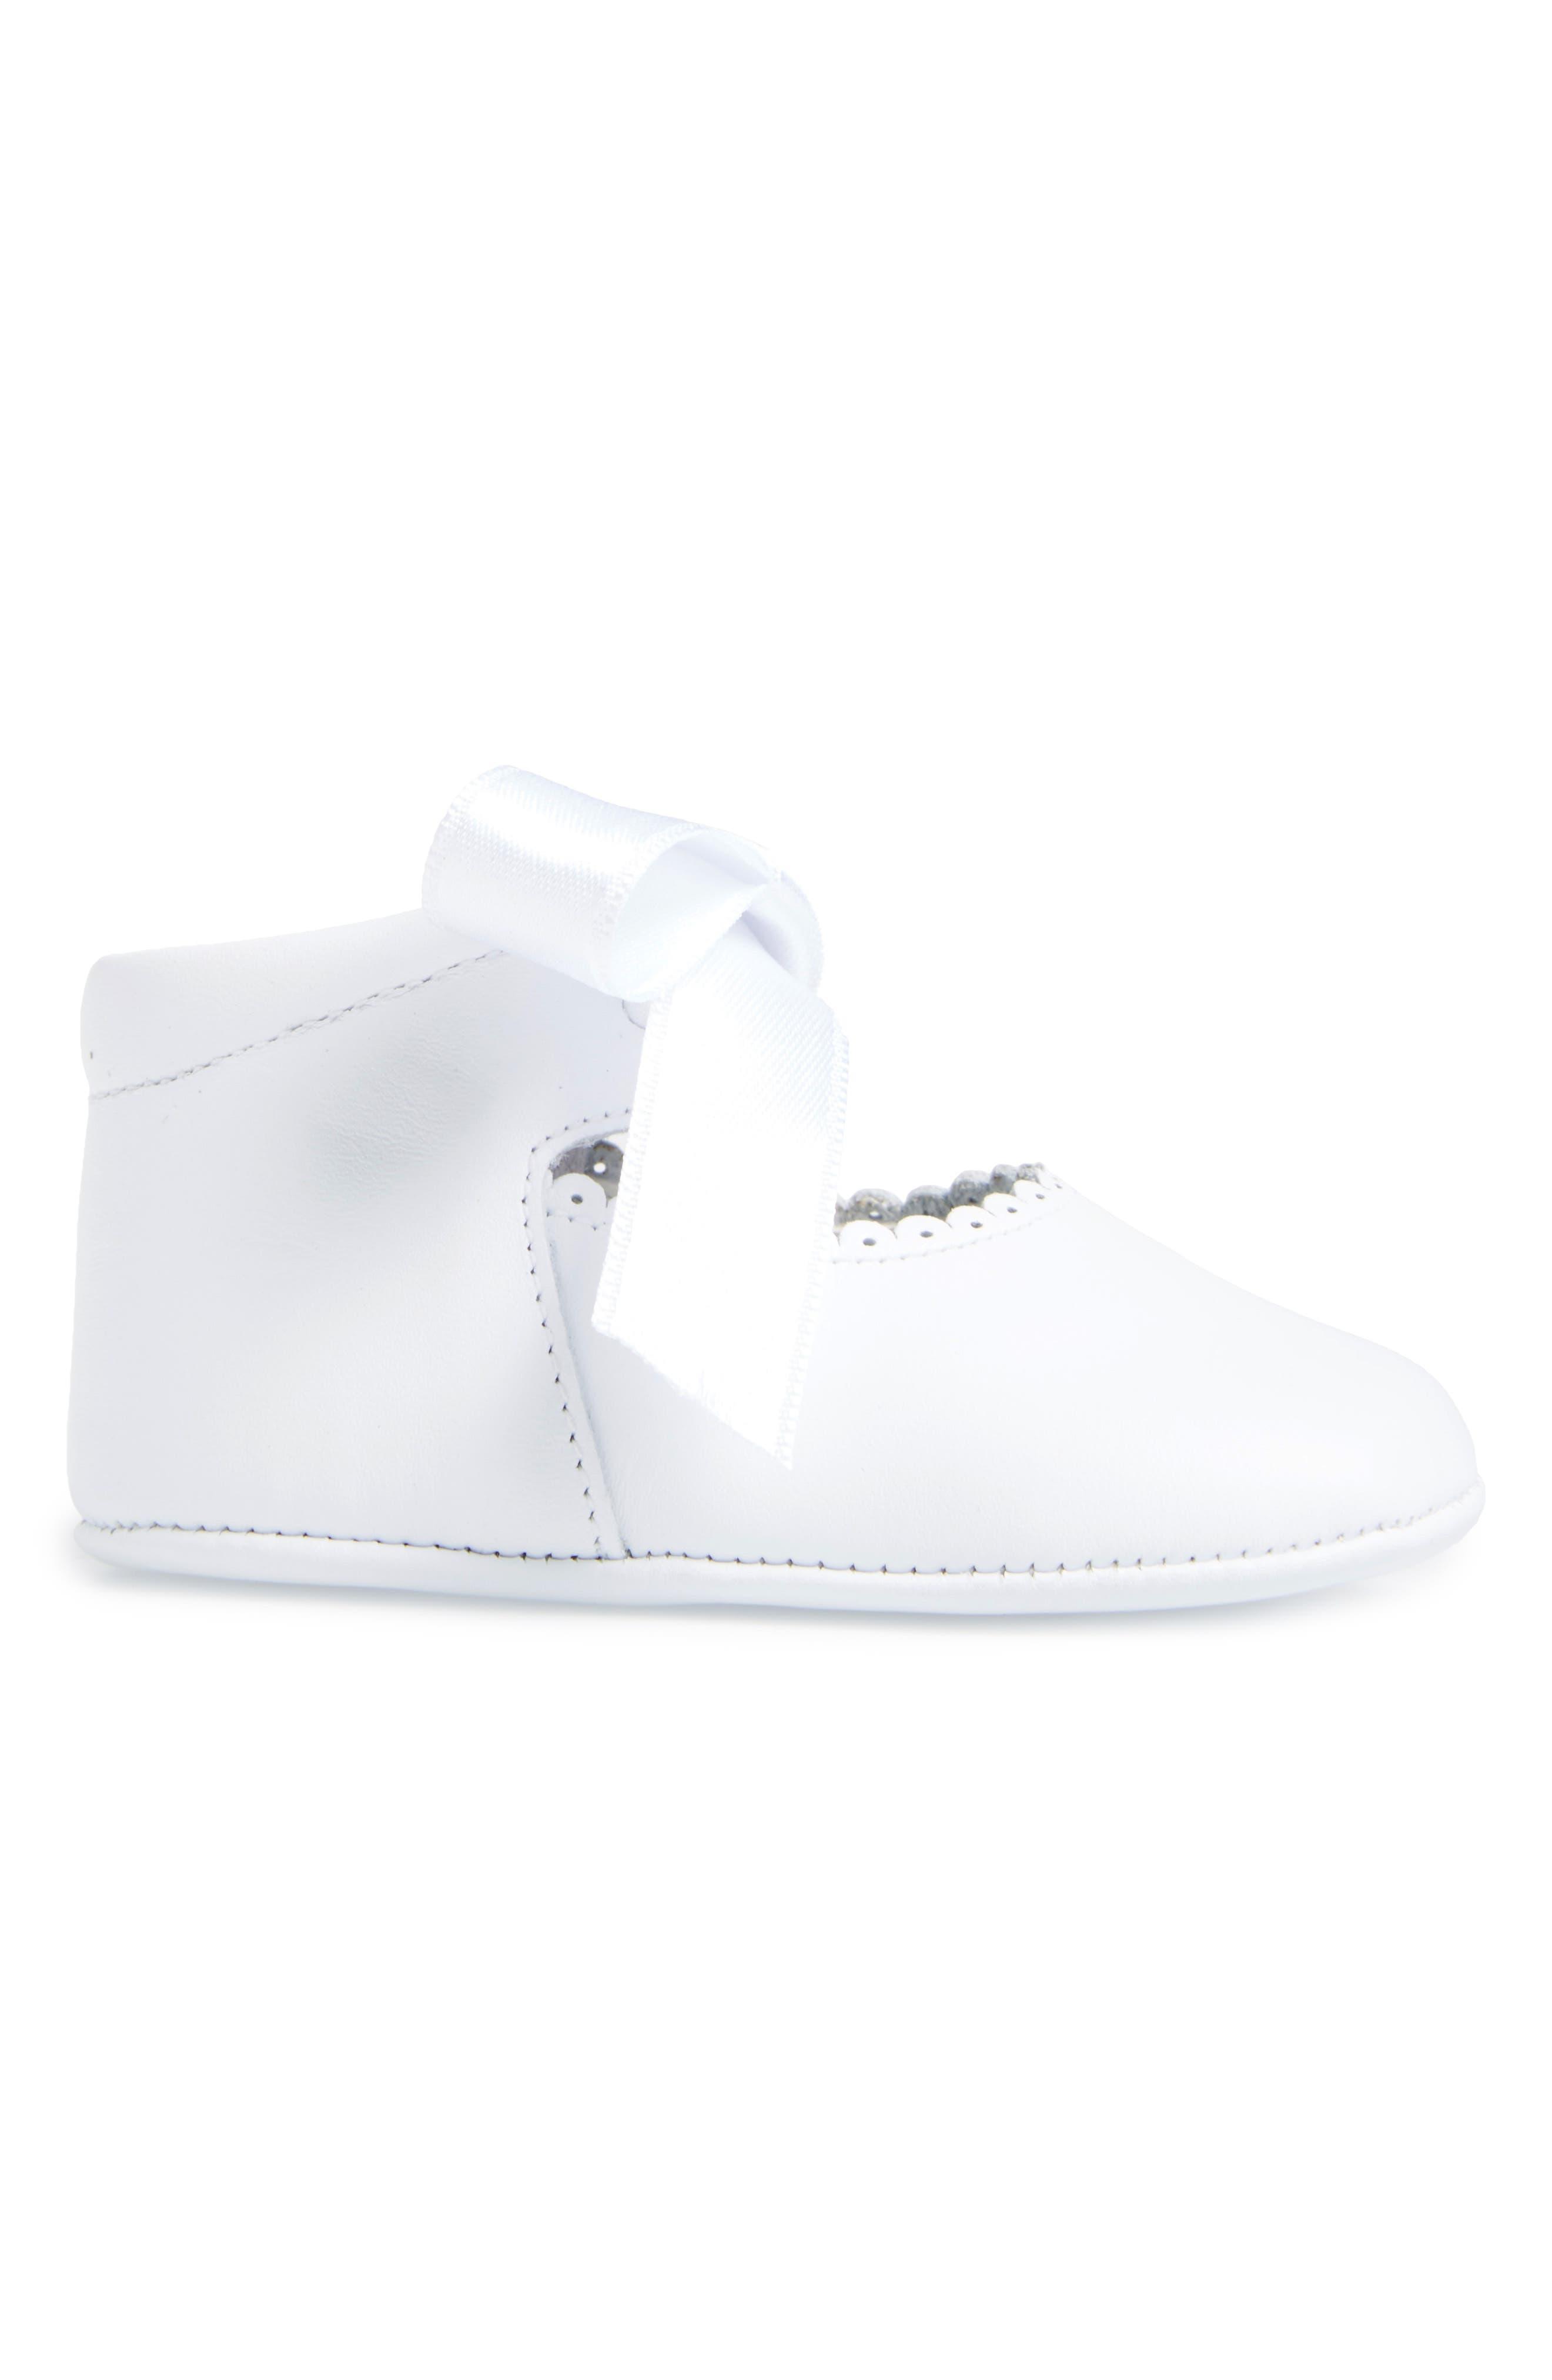 Satin Bow Crib Shoe,                             Alternate thumbnail 3, color,                             WHITE